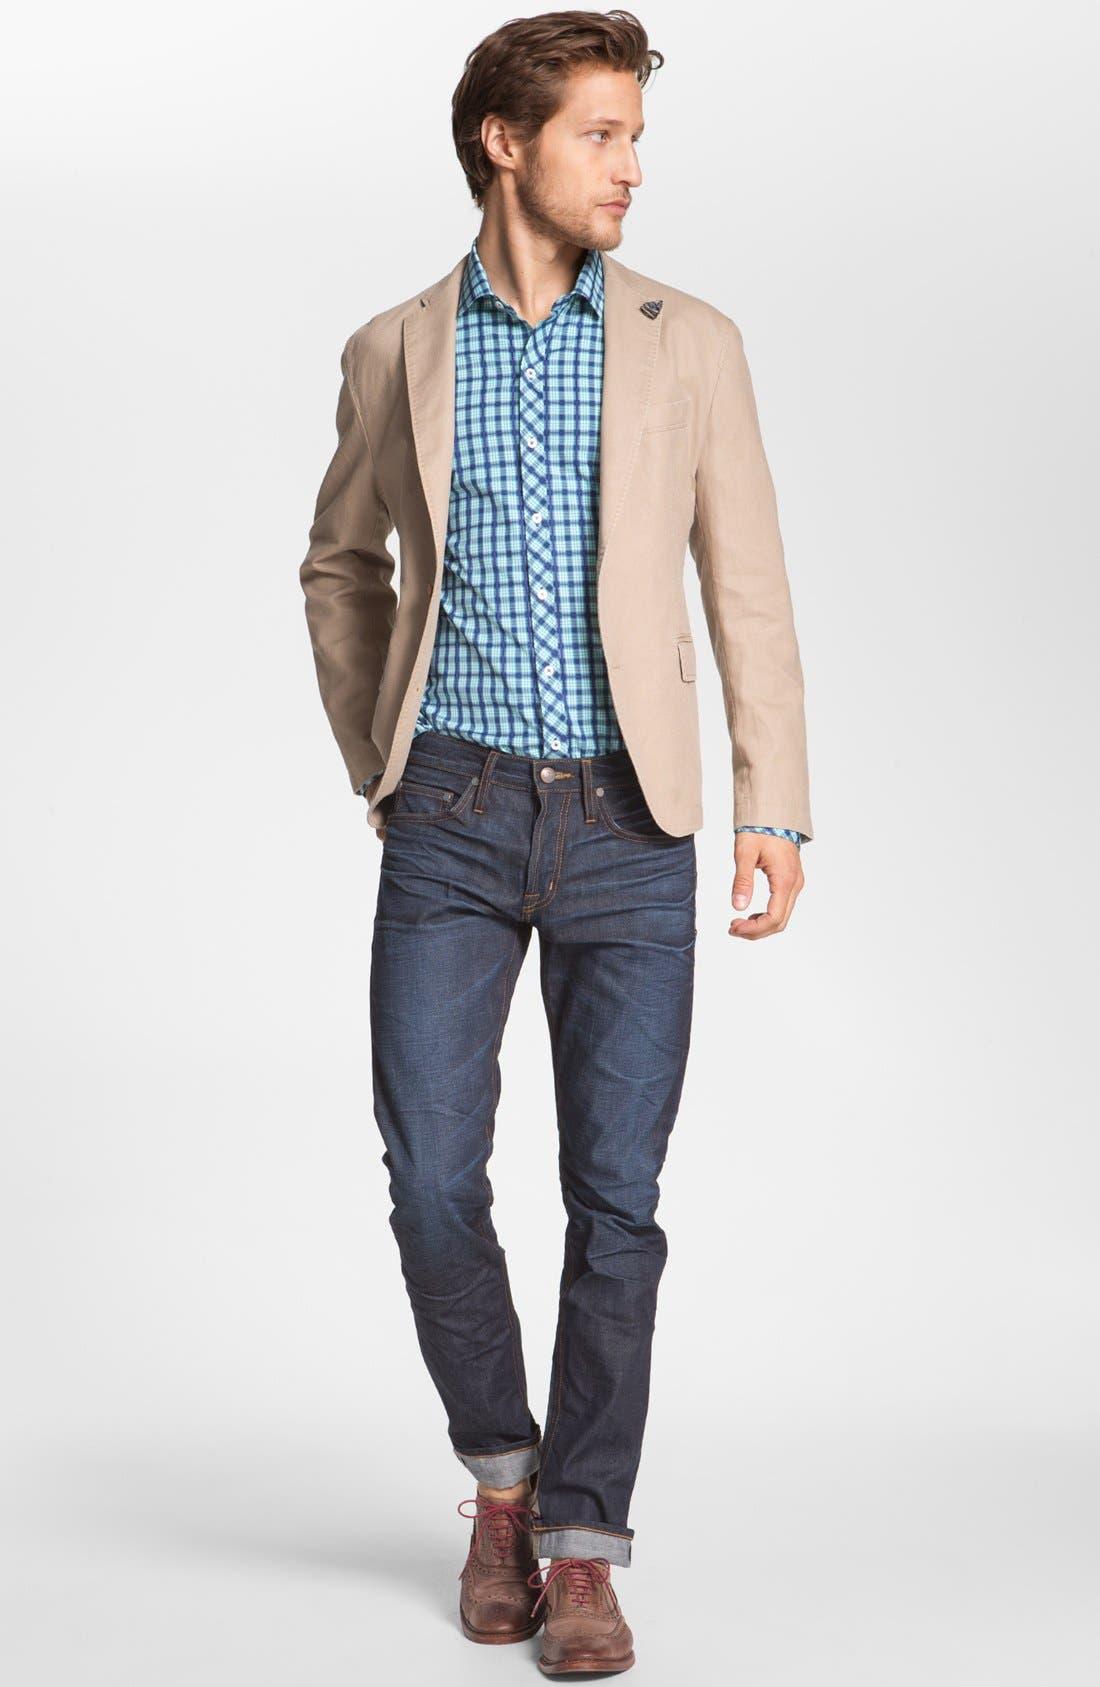 ASBURY PARK,                             '1888 Skinny Fit' Raw Selvedge Jeans,                             Alternate thumbnail 5, color,                             401